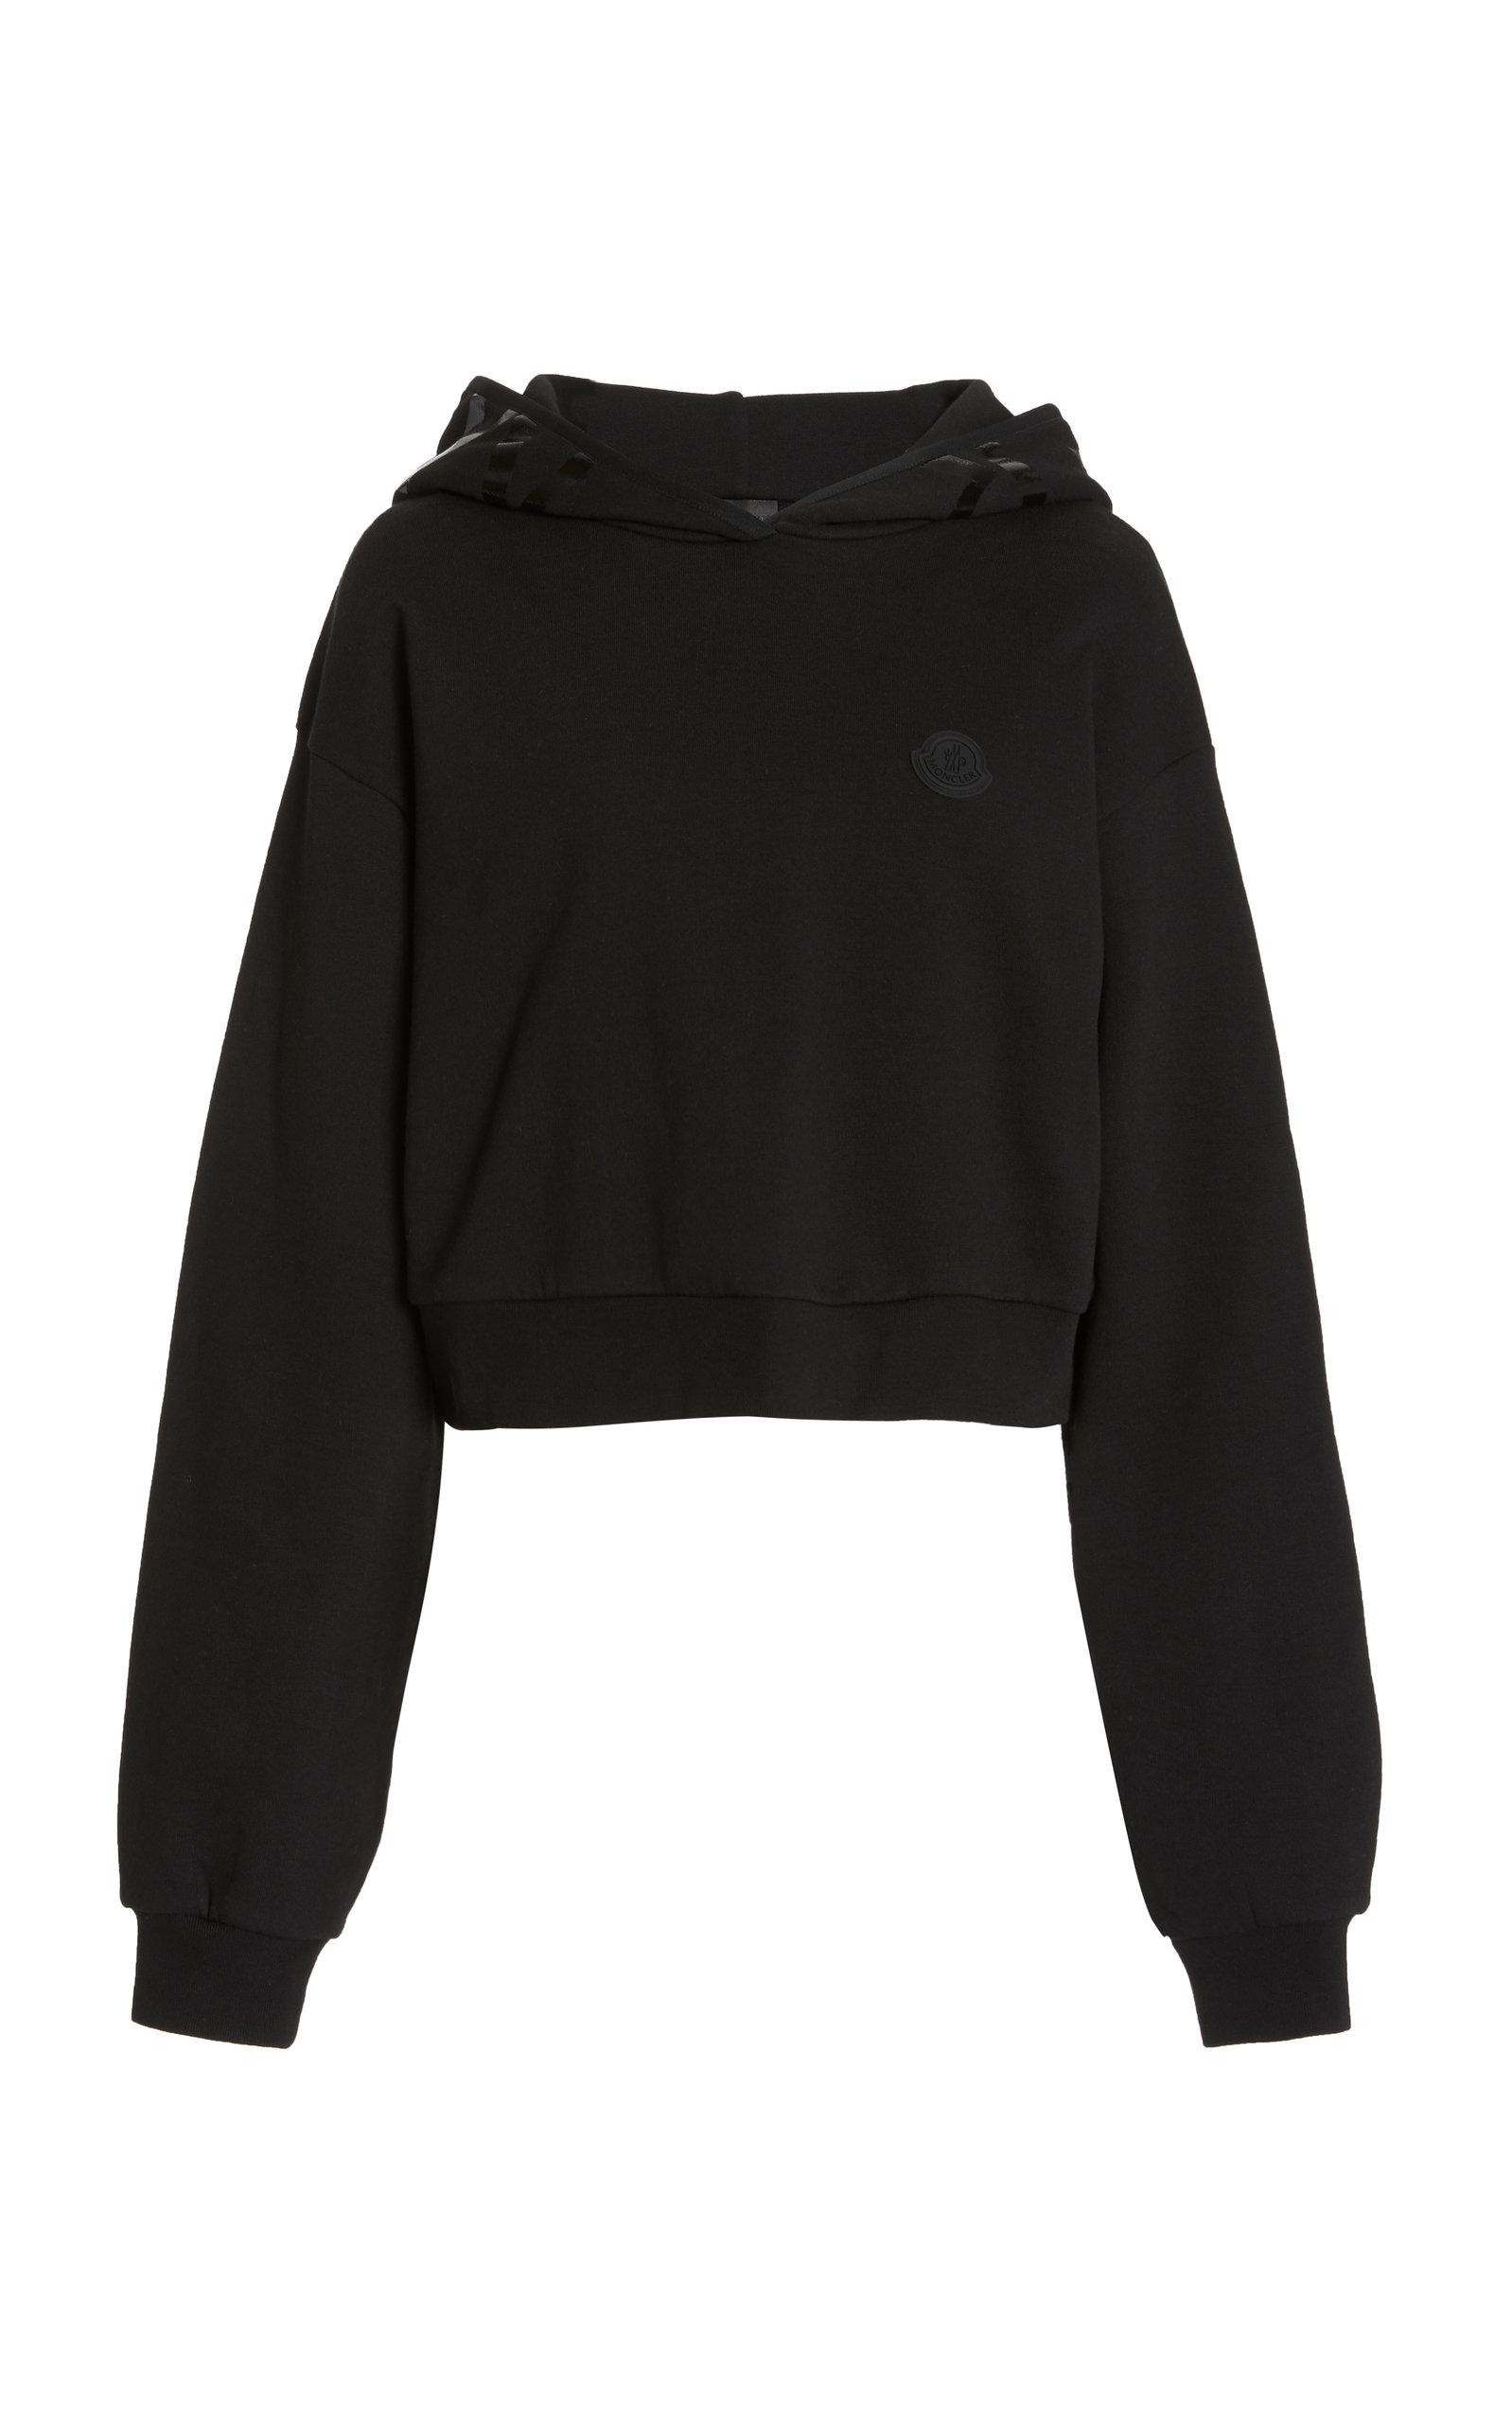 Moncler - Women's Oversized Logo-Detailed Cotton-Blend Hoodie - Black - Moda Operandi